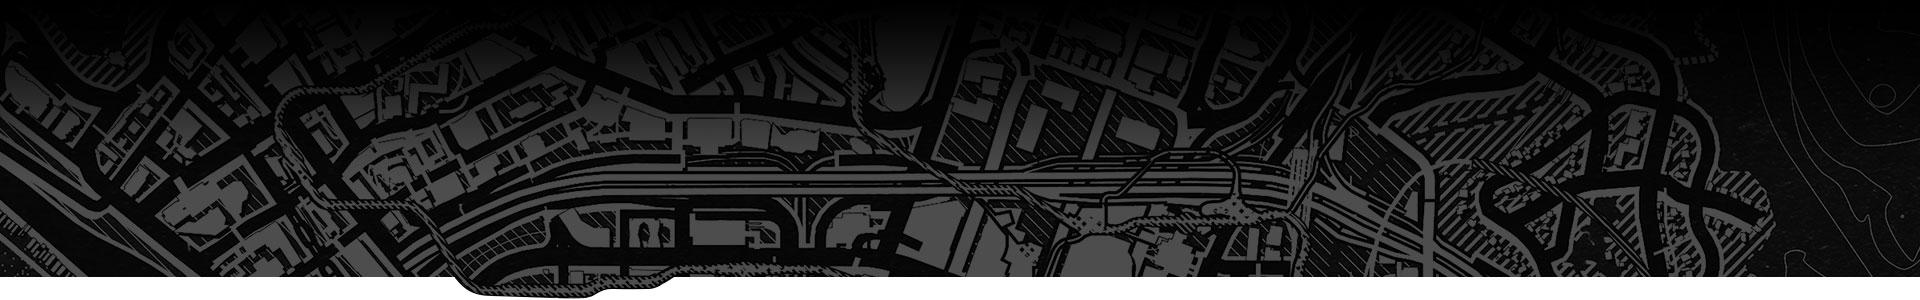 Los Santos 的黑白地圖。